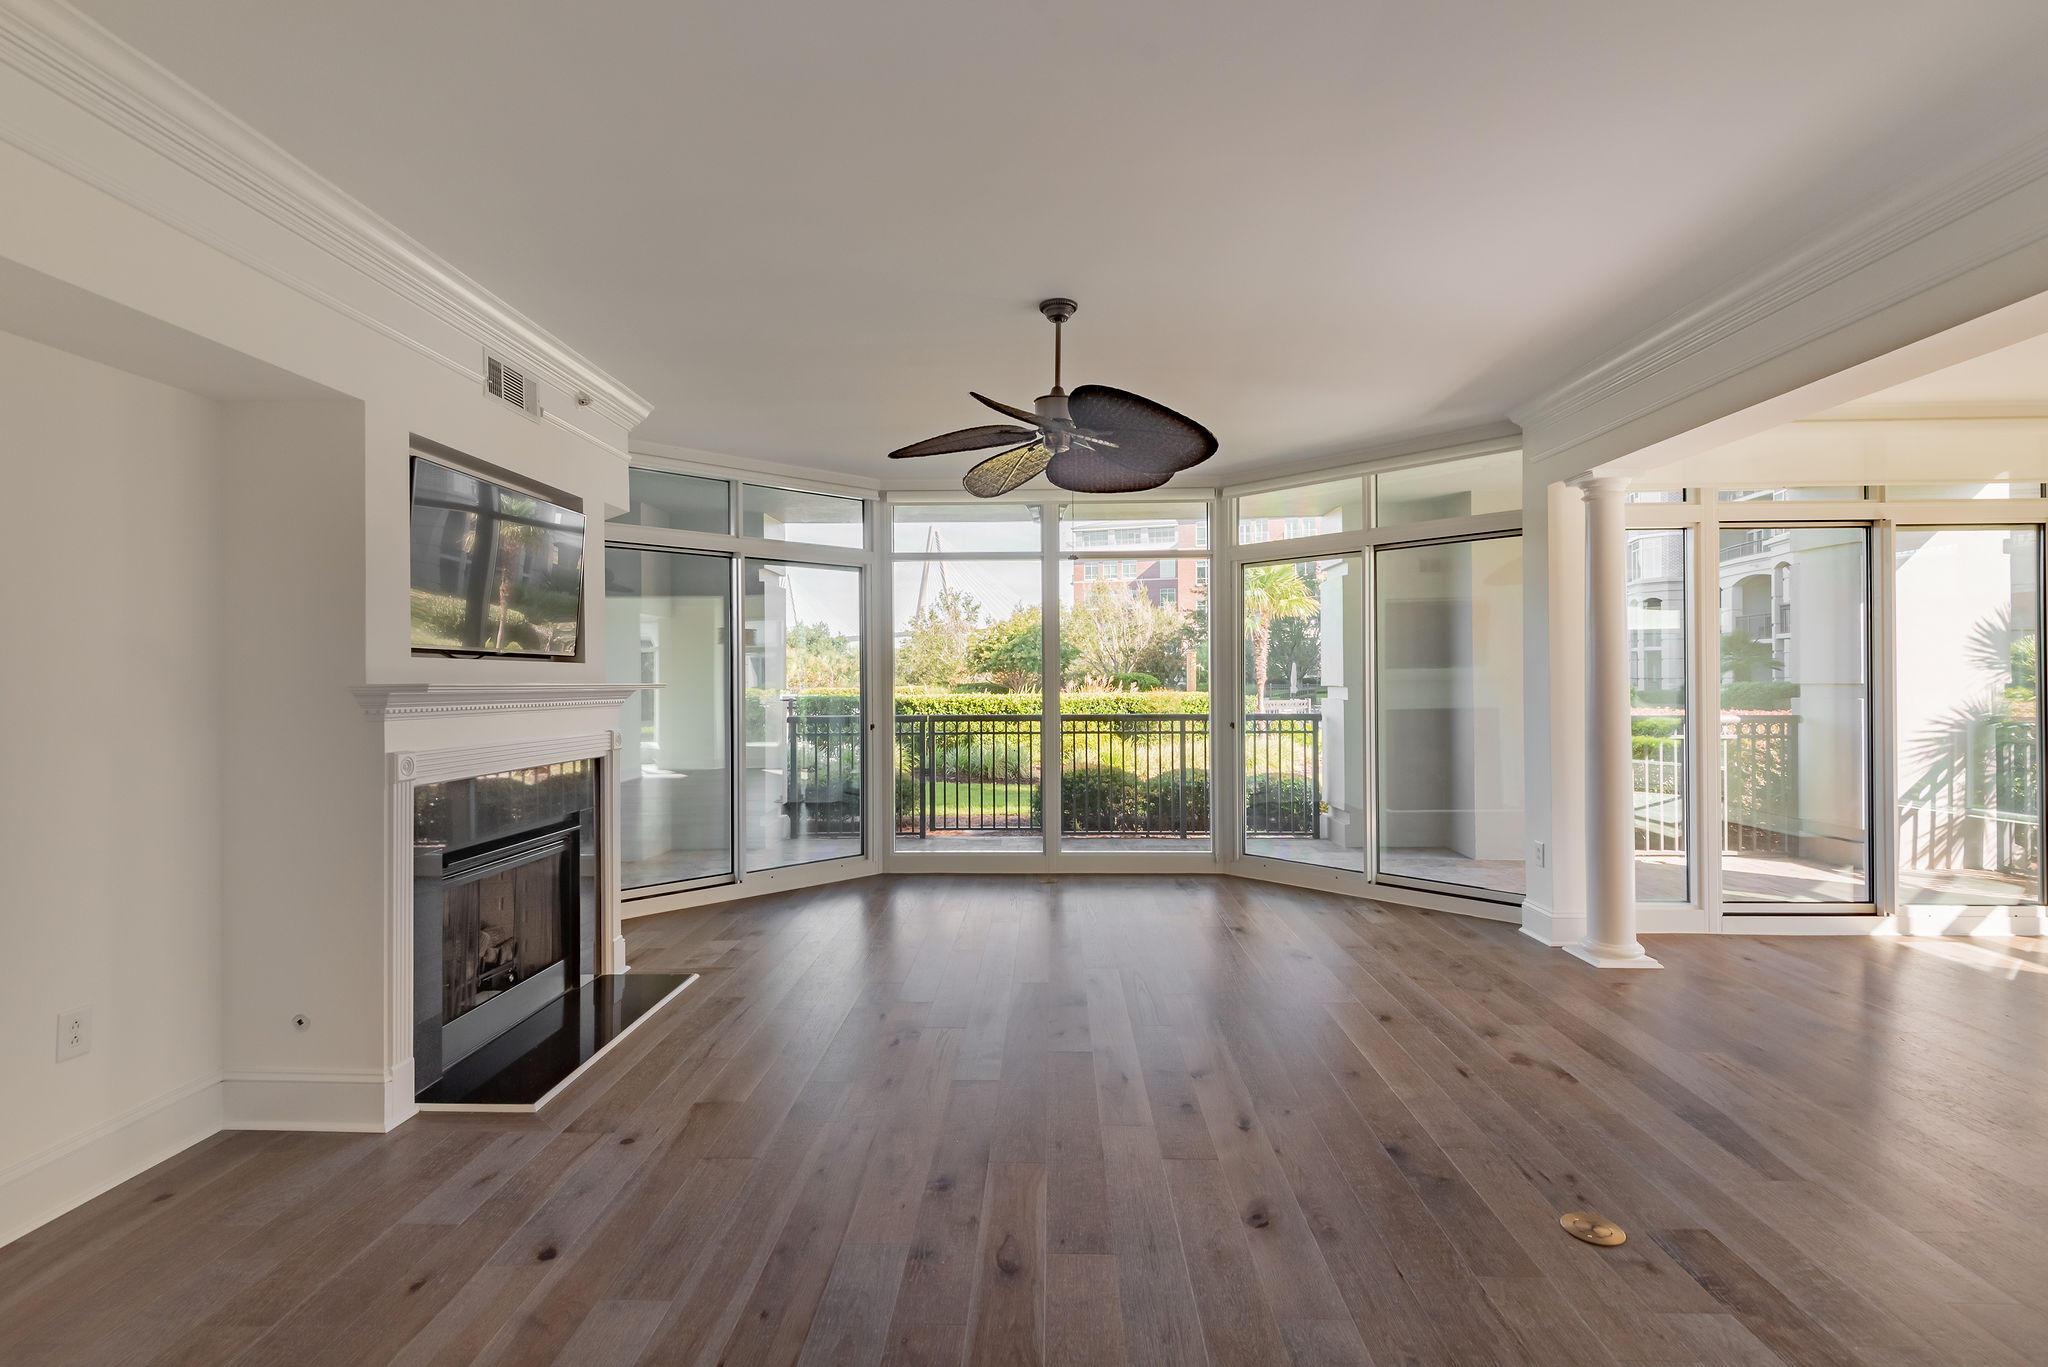 Renaissance On Chas Harbor Homes For Sale - 211 Plaza, Mount Pleasant, SC - 11